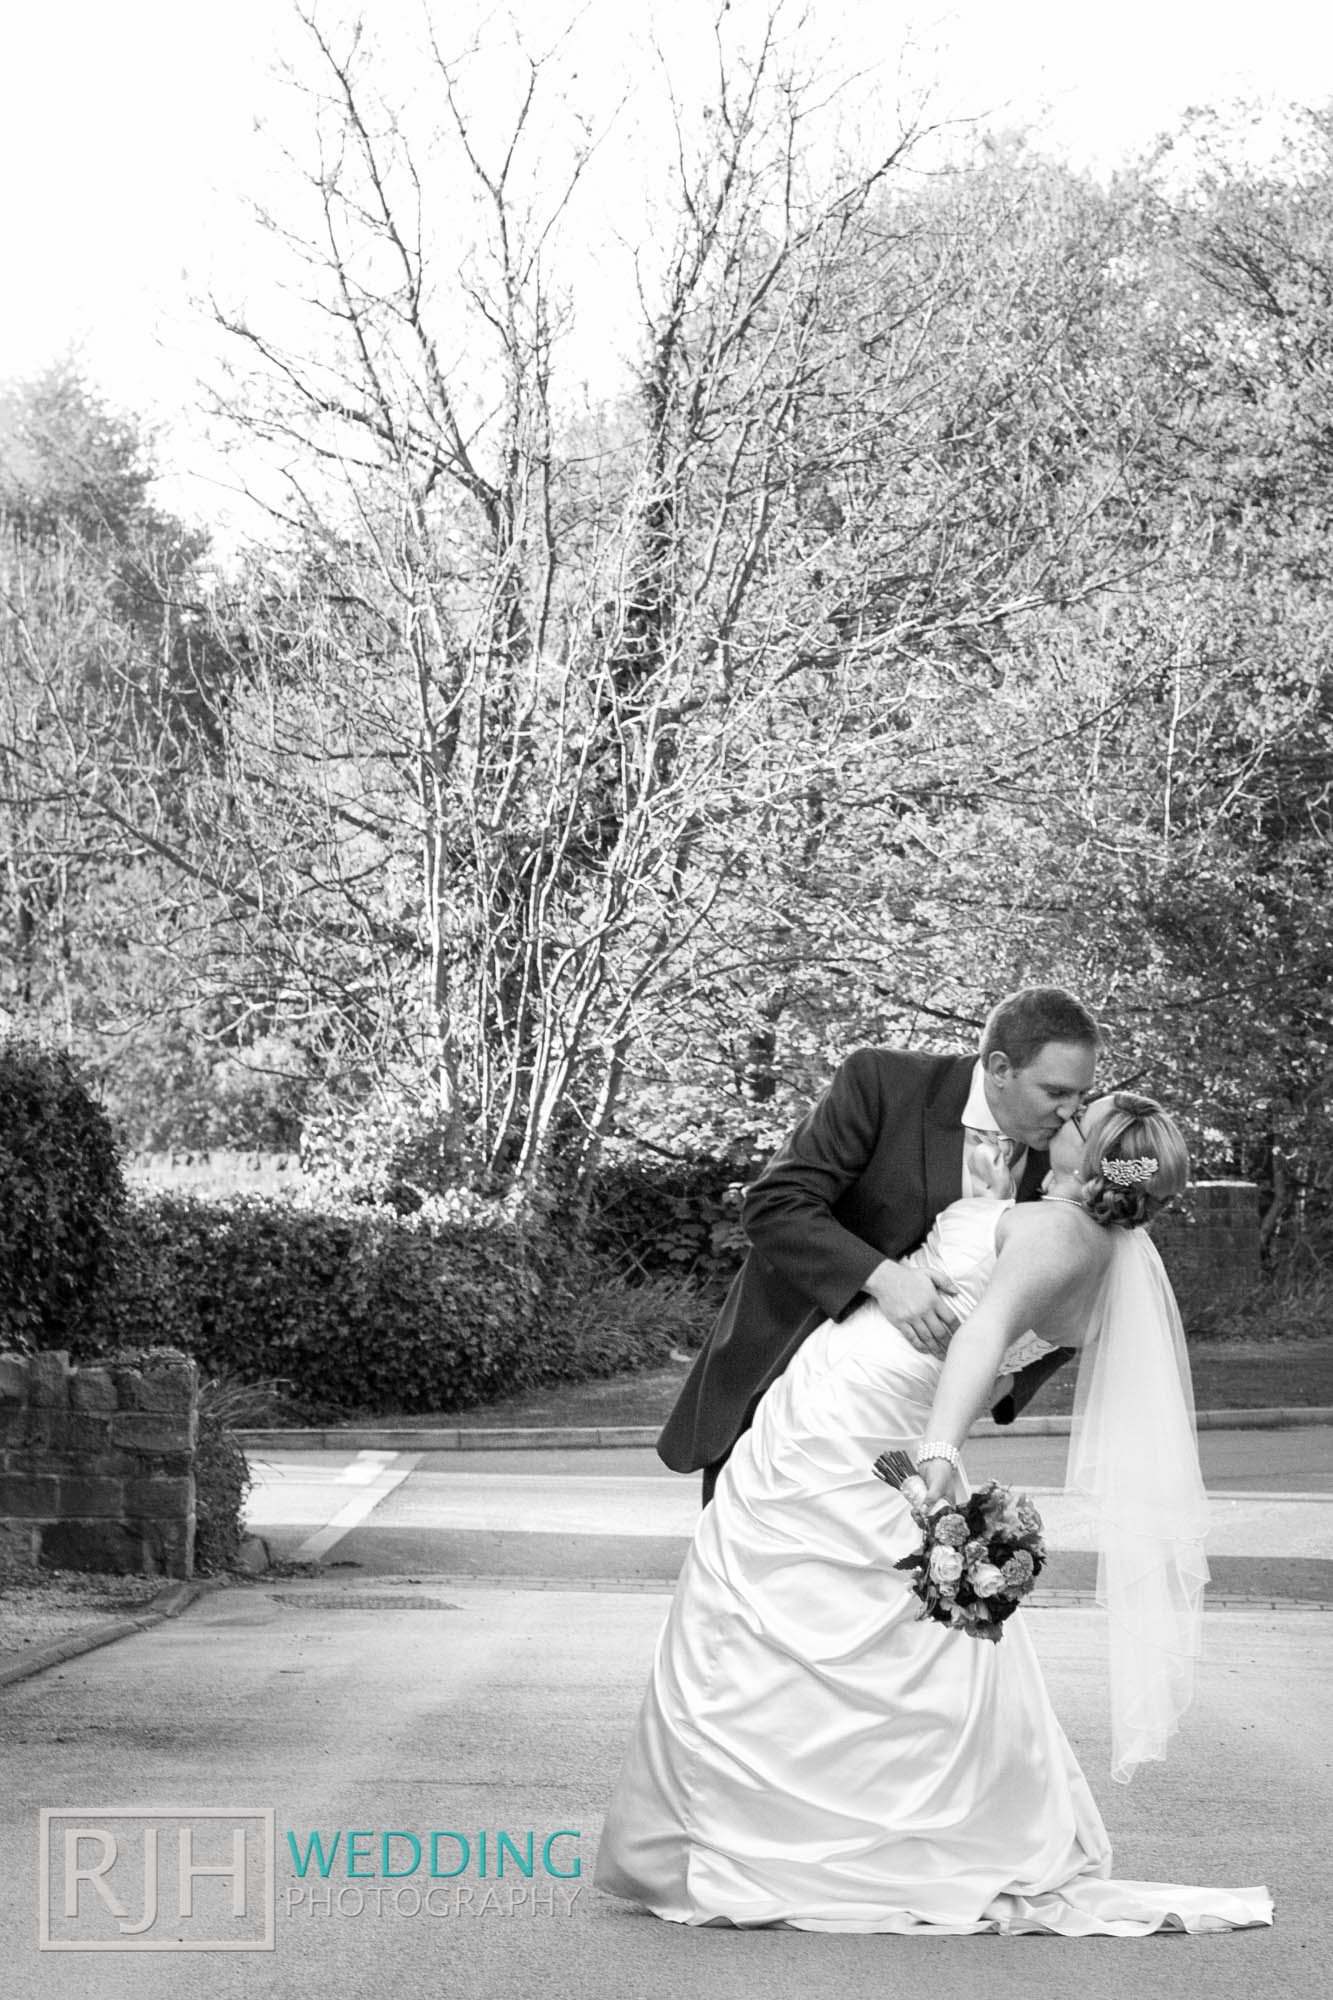 RJH Wedding Photography_2014 highlights_07.jpg